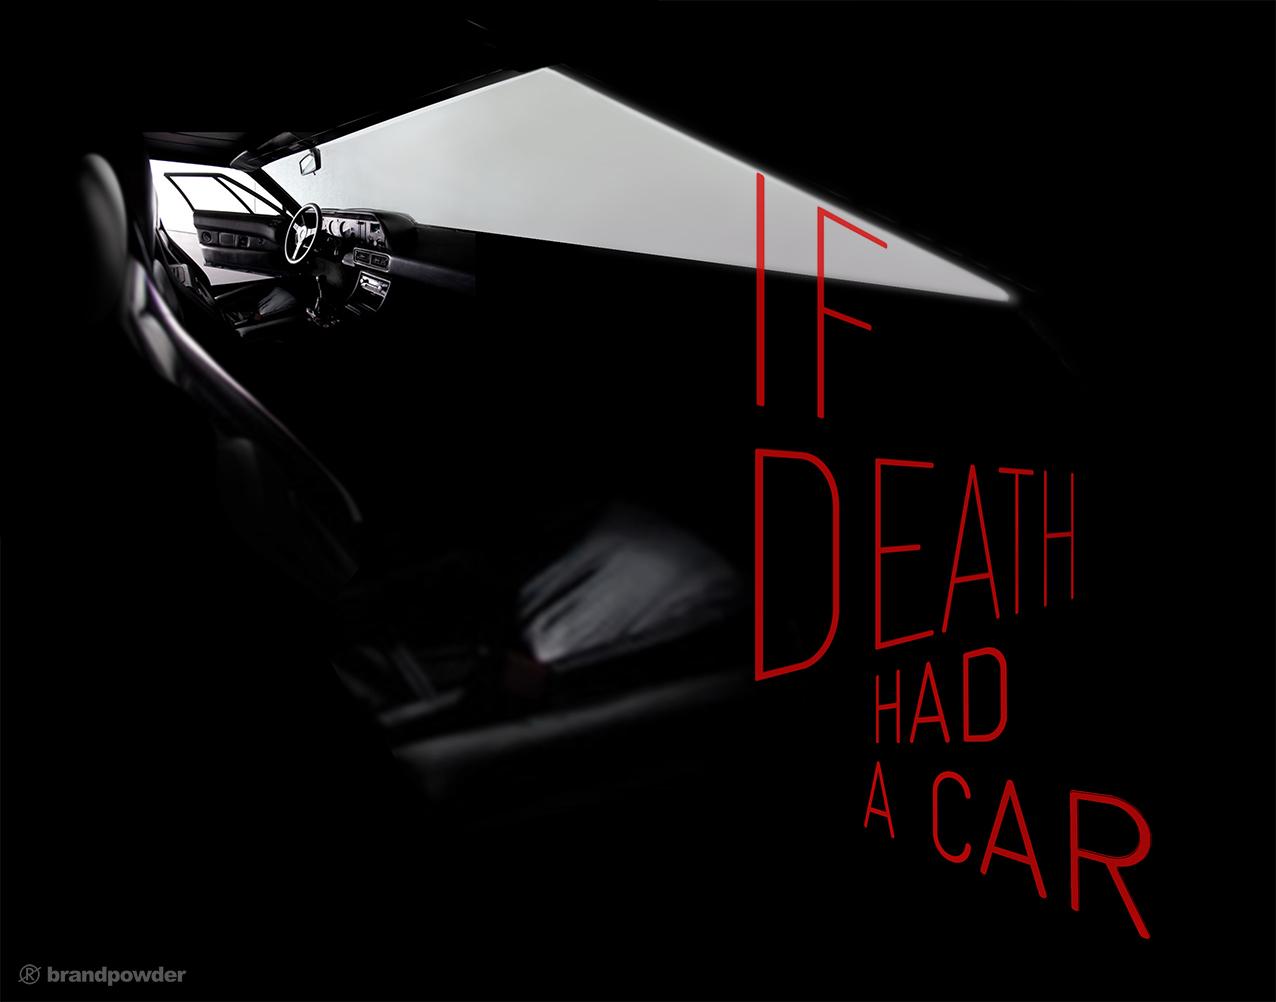 IF DEATH HAD A CAR